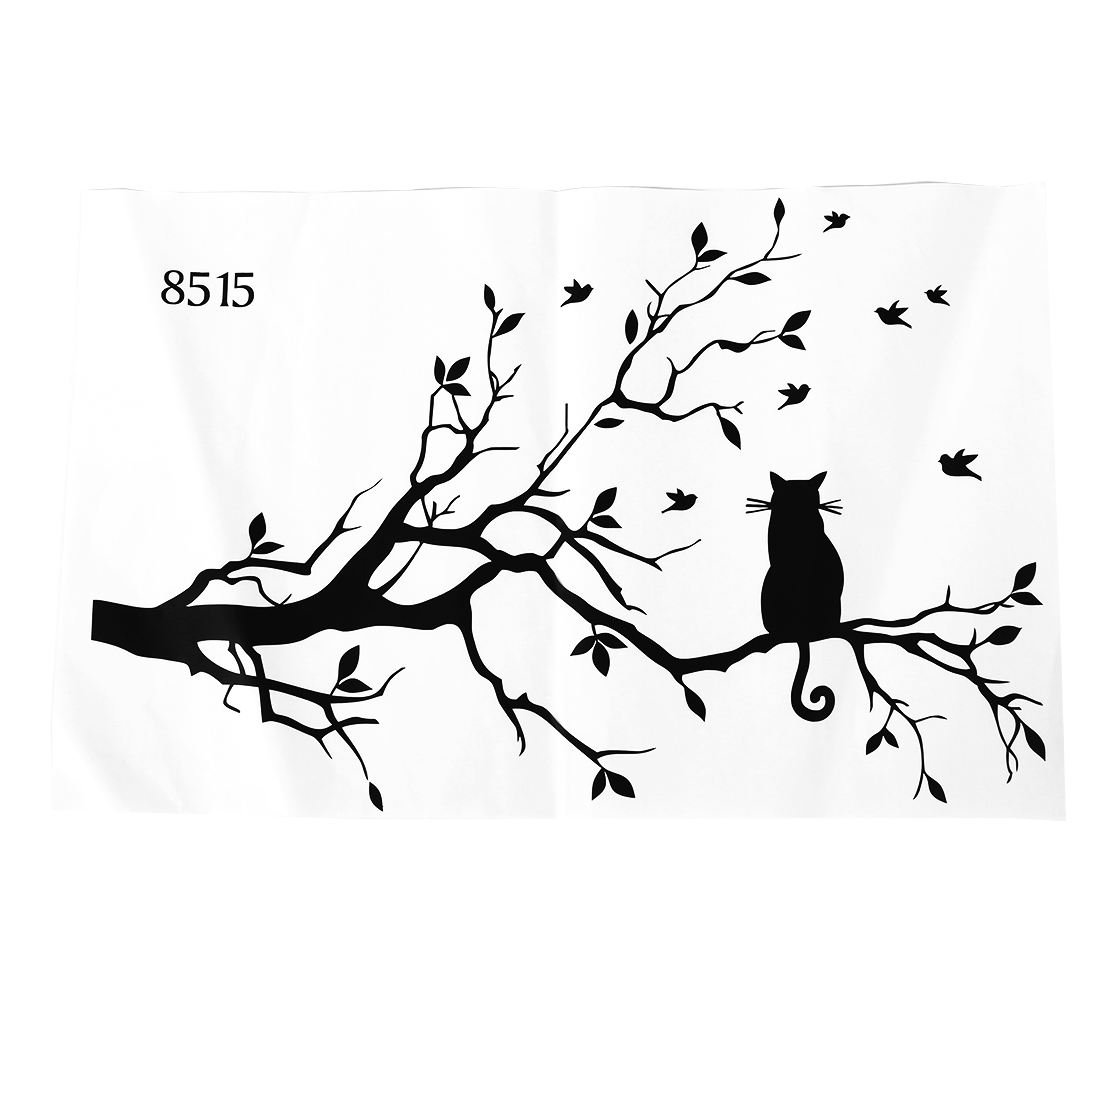 SODIAL(R) Newly designed Cat On Long Tree Branch DIY Vinyl Wall Sticker Animals Birds Wall Decal Art Transfers Window Sticker Home Decor-99*150cm